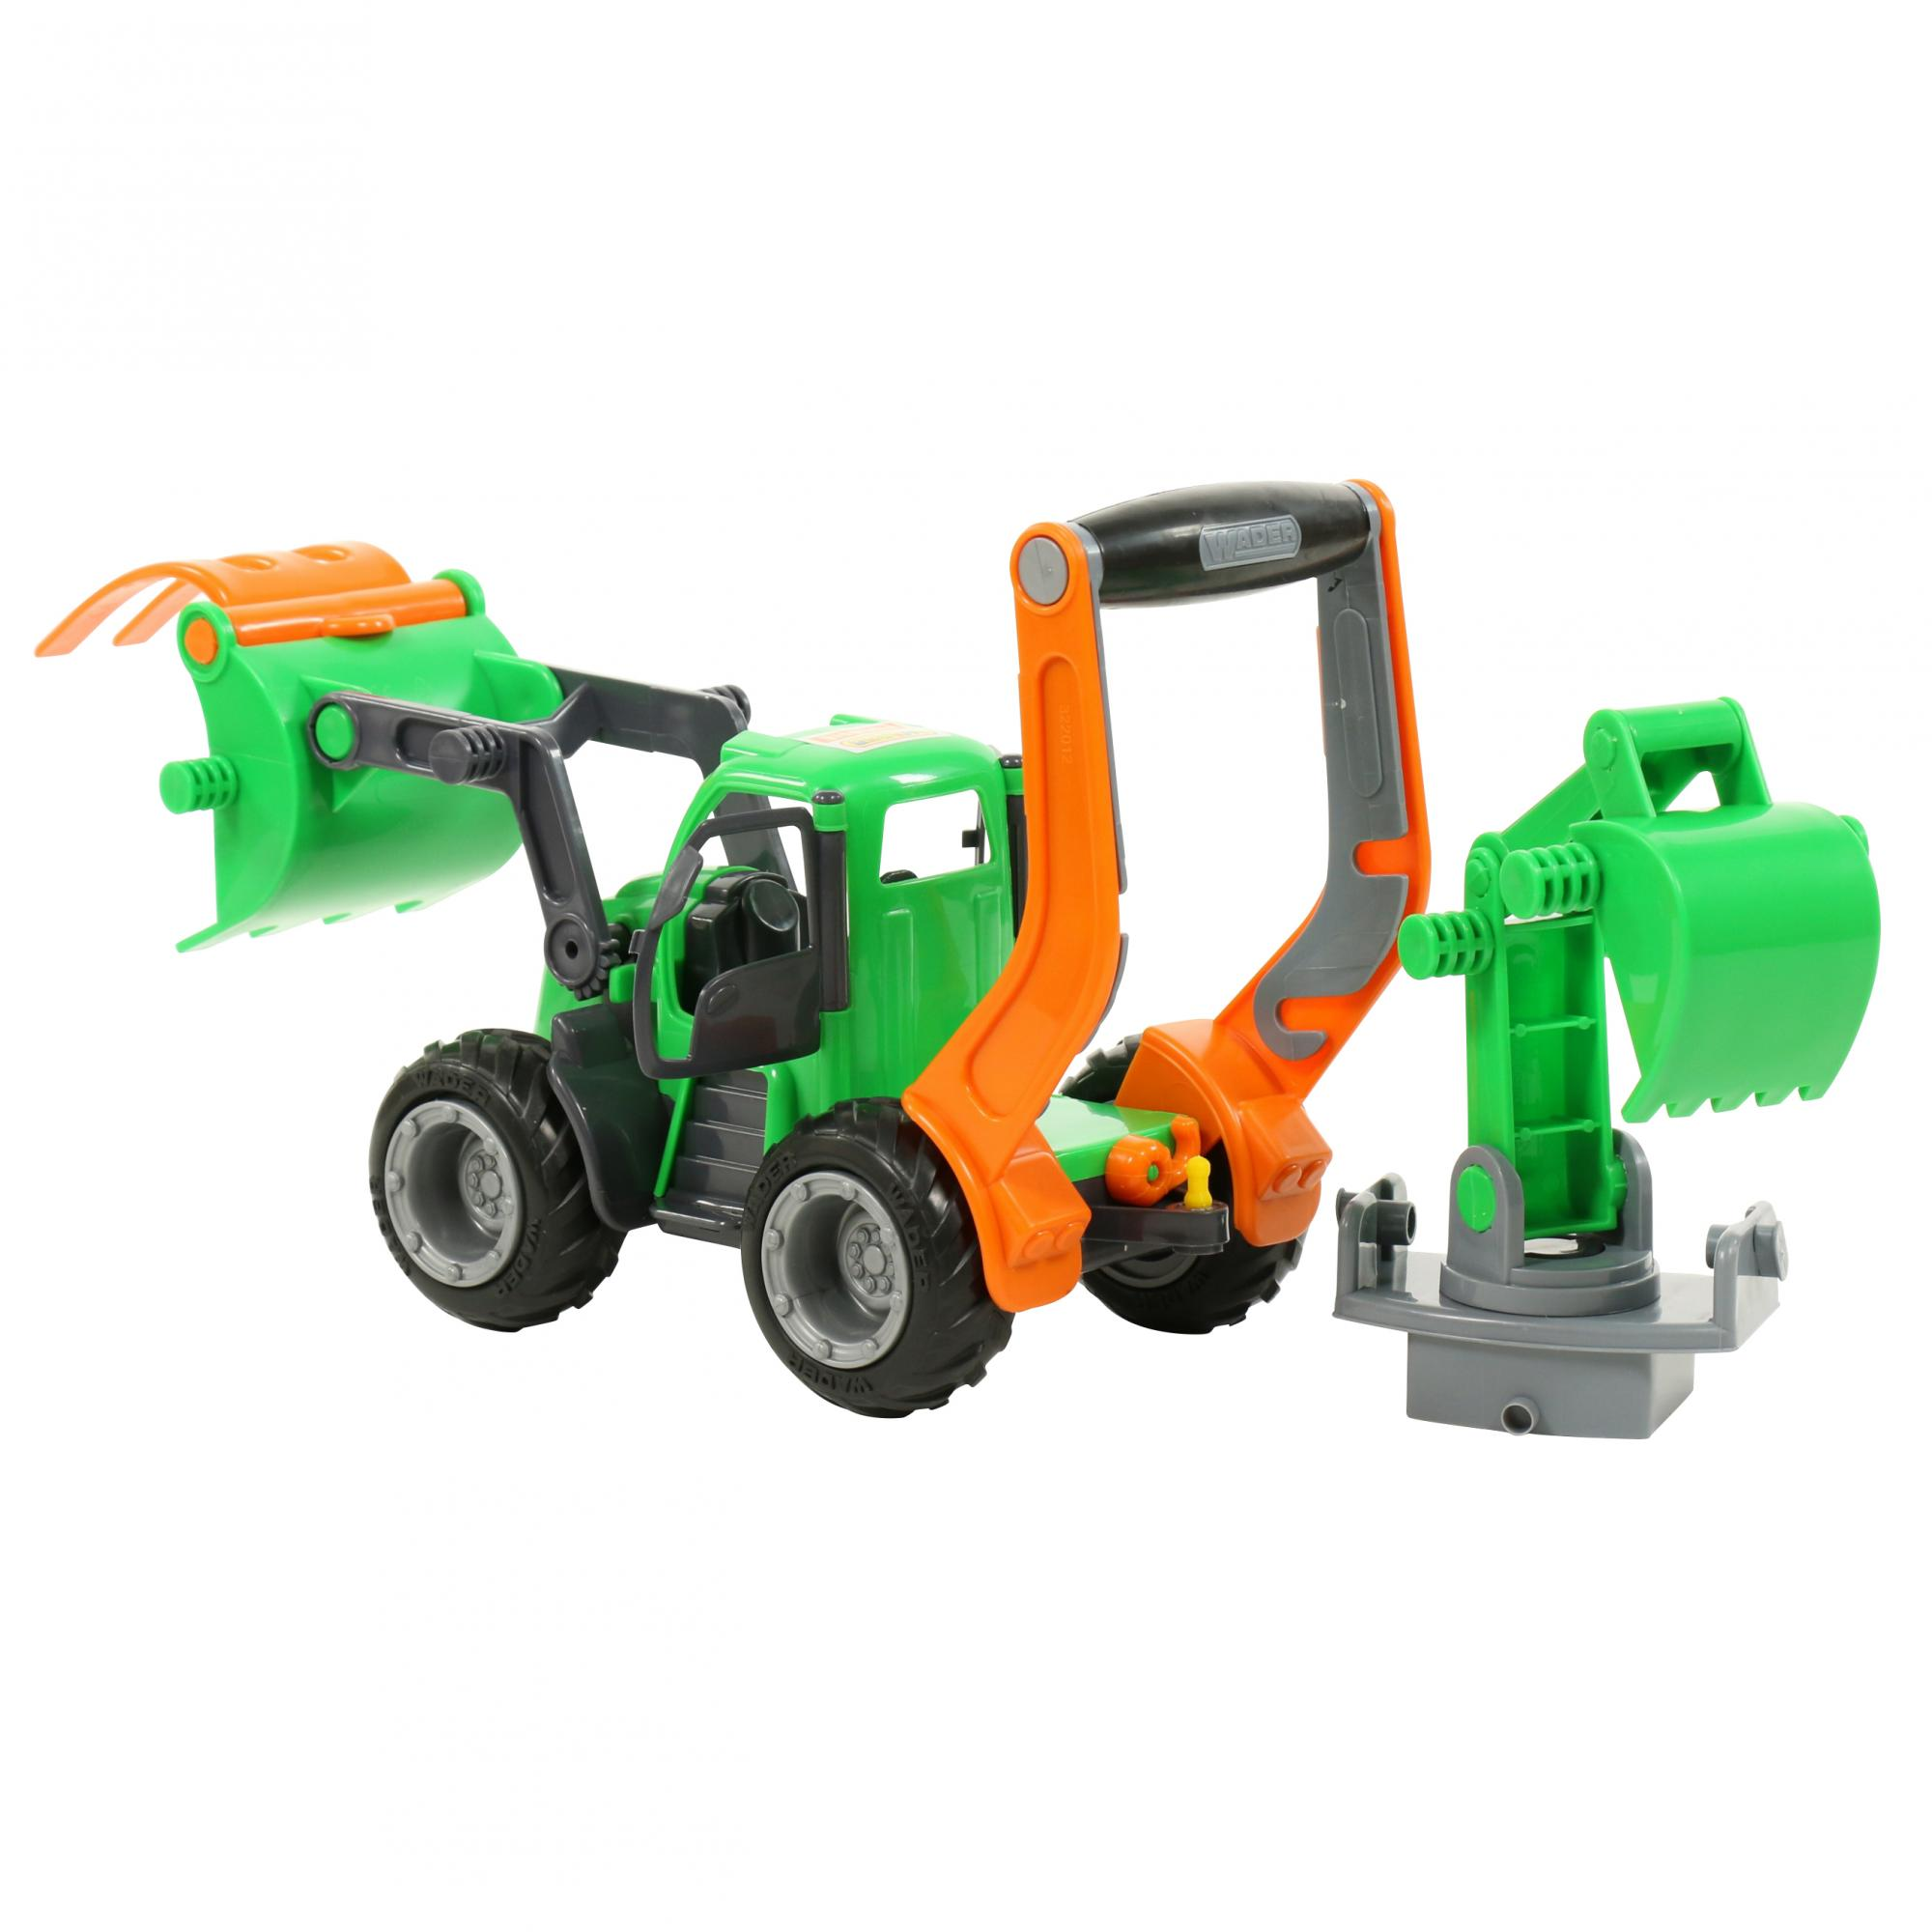 Máy xúc Griptrac đồ chơi Wader Toys